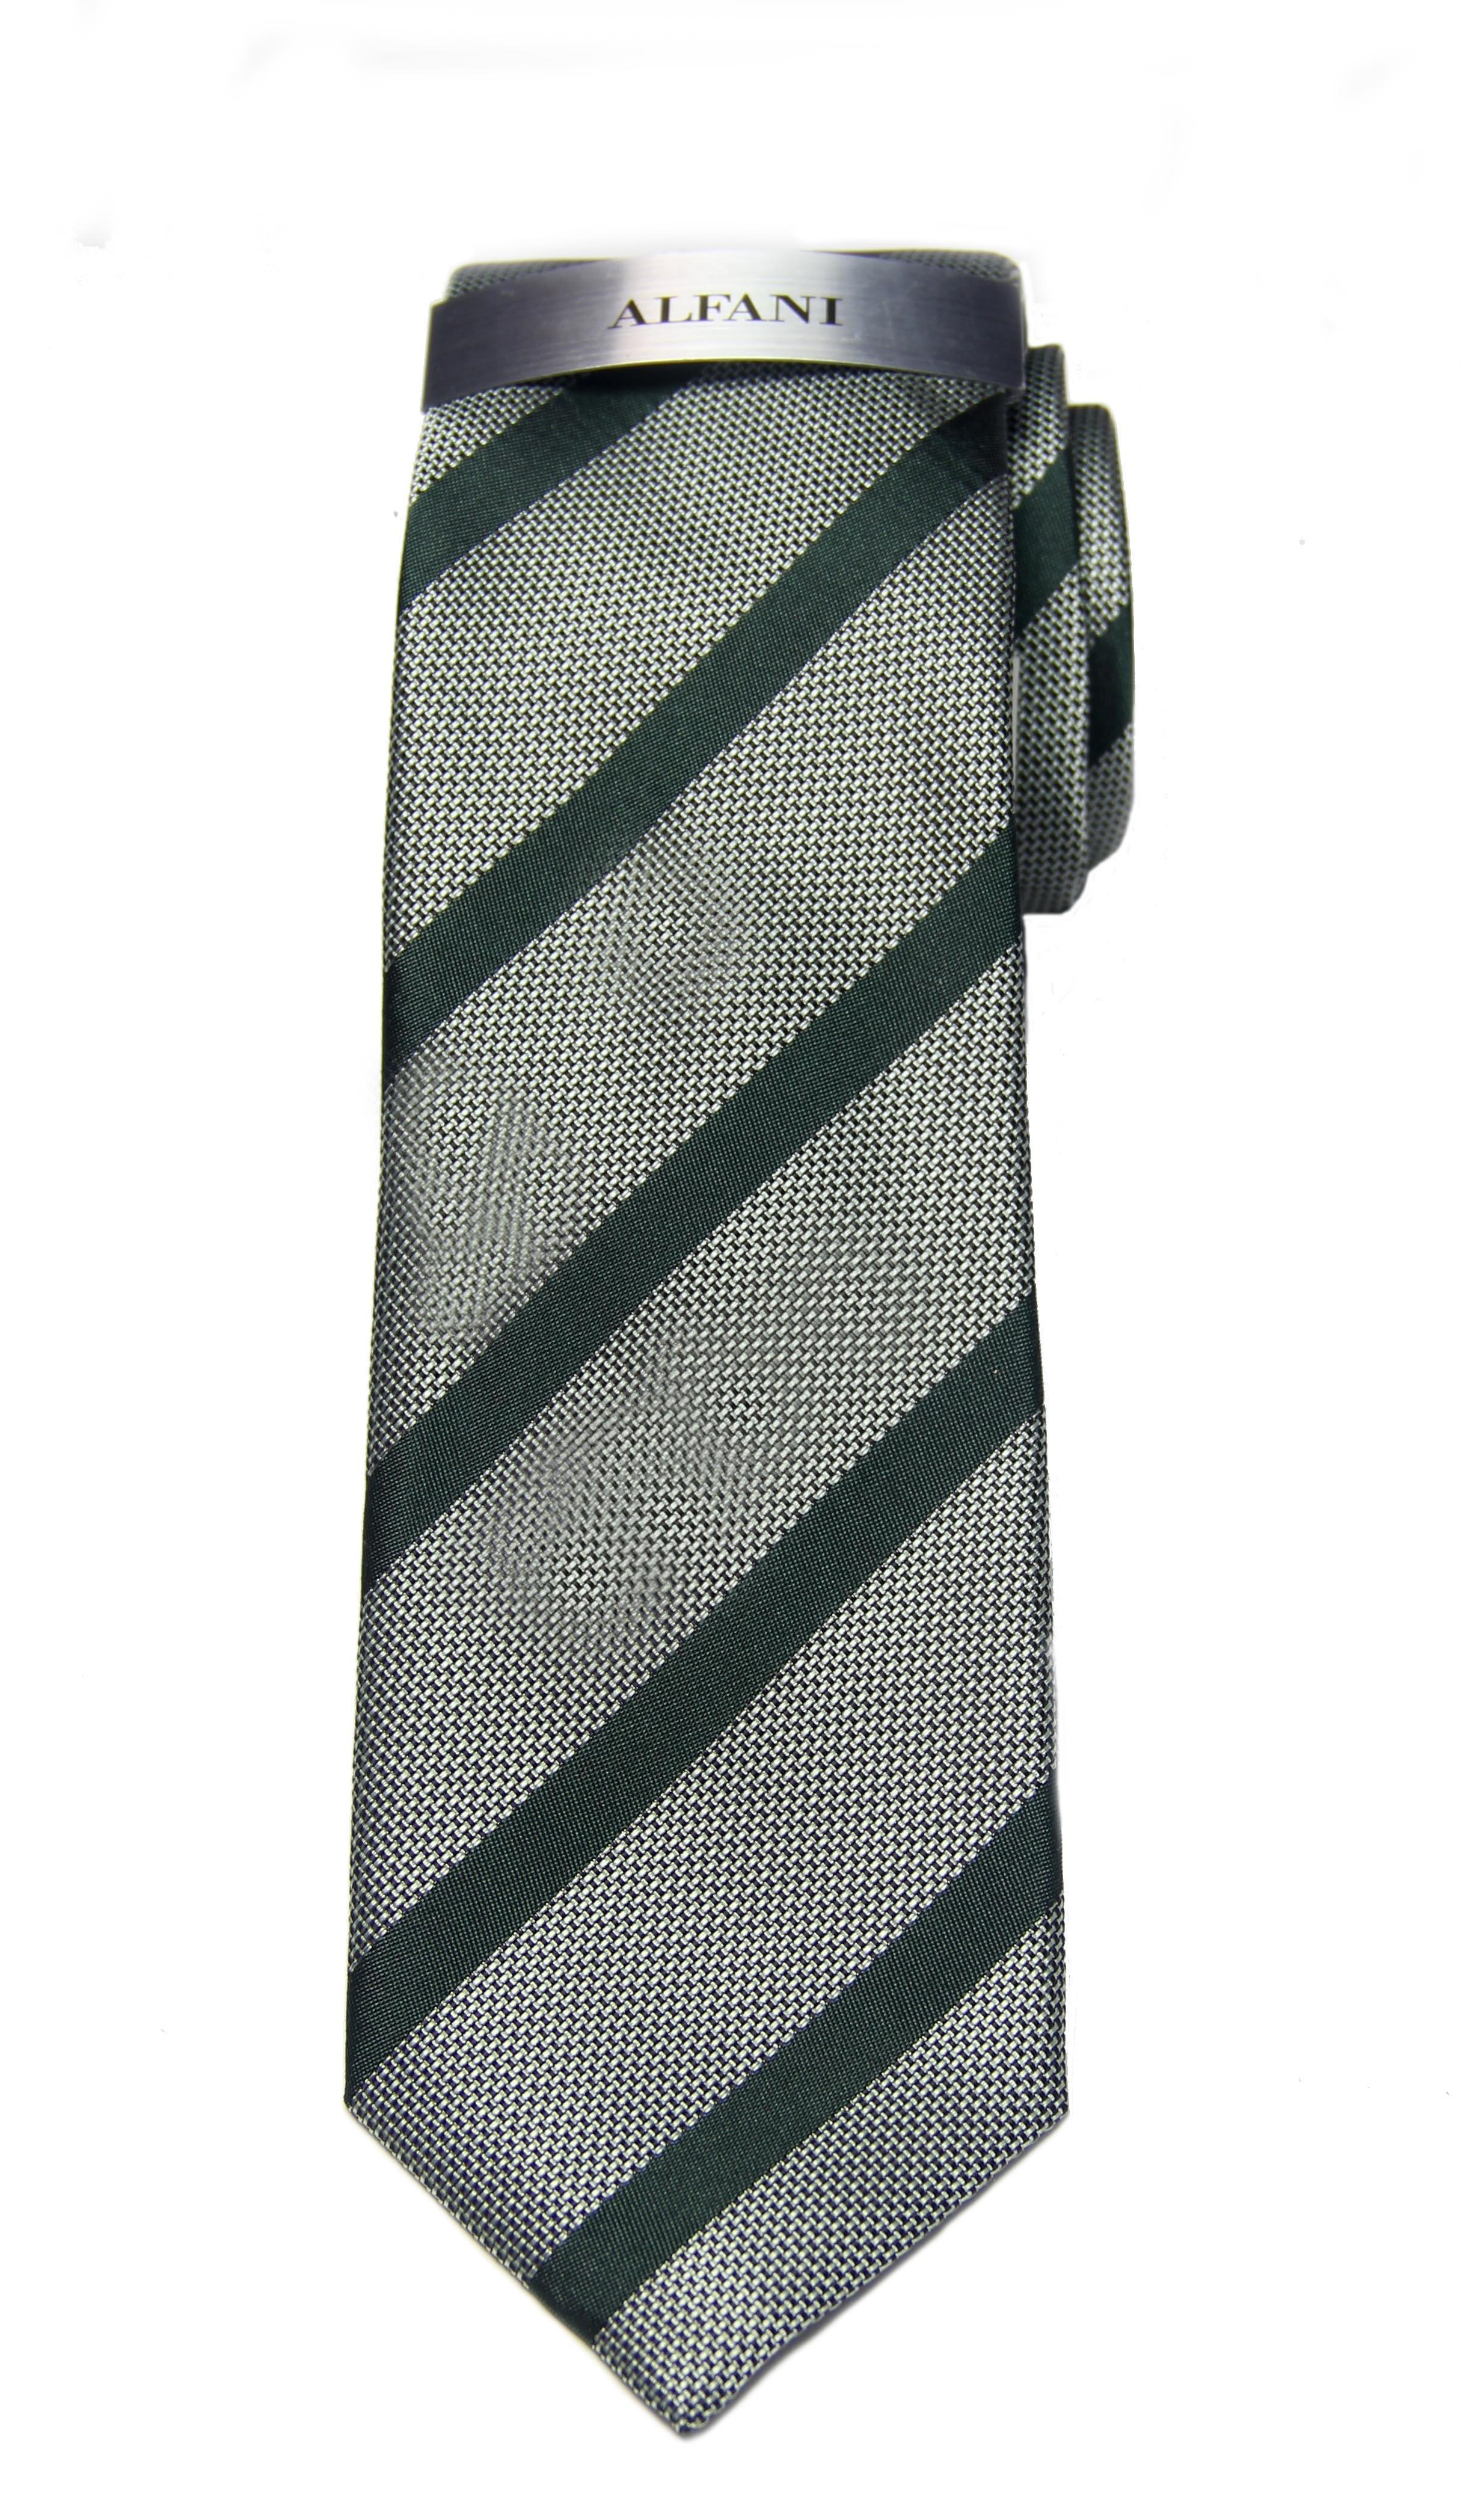 Alfani Hawks Stripe Tie Green Striped Narrow Men's